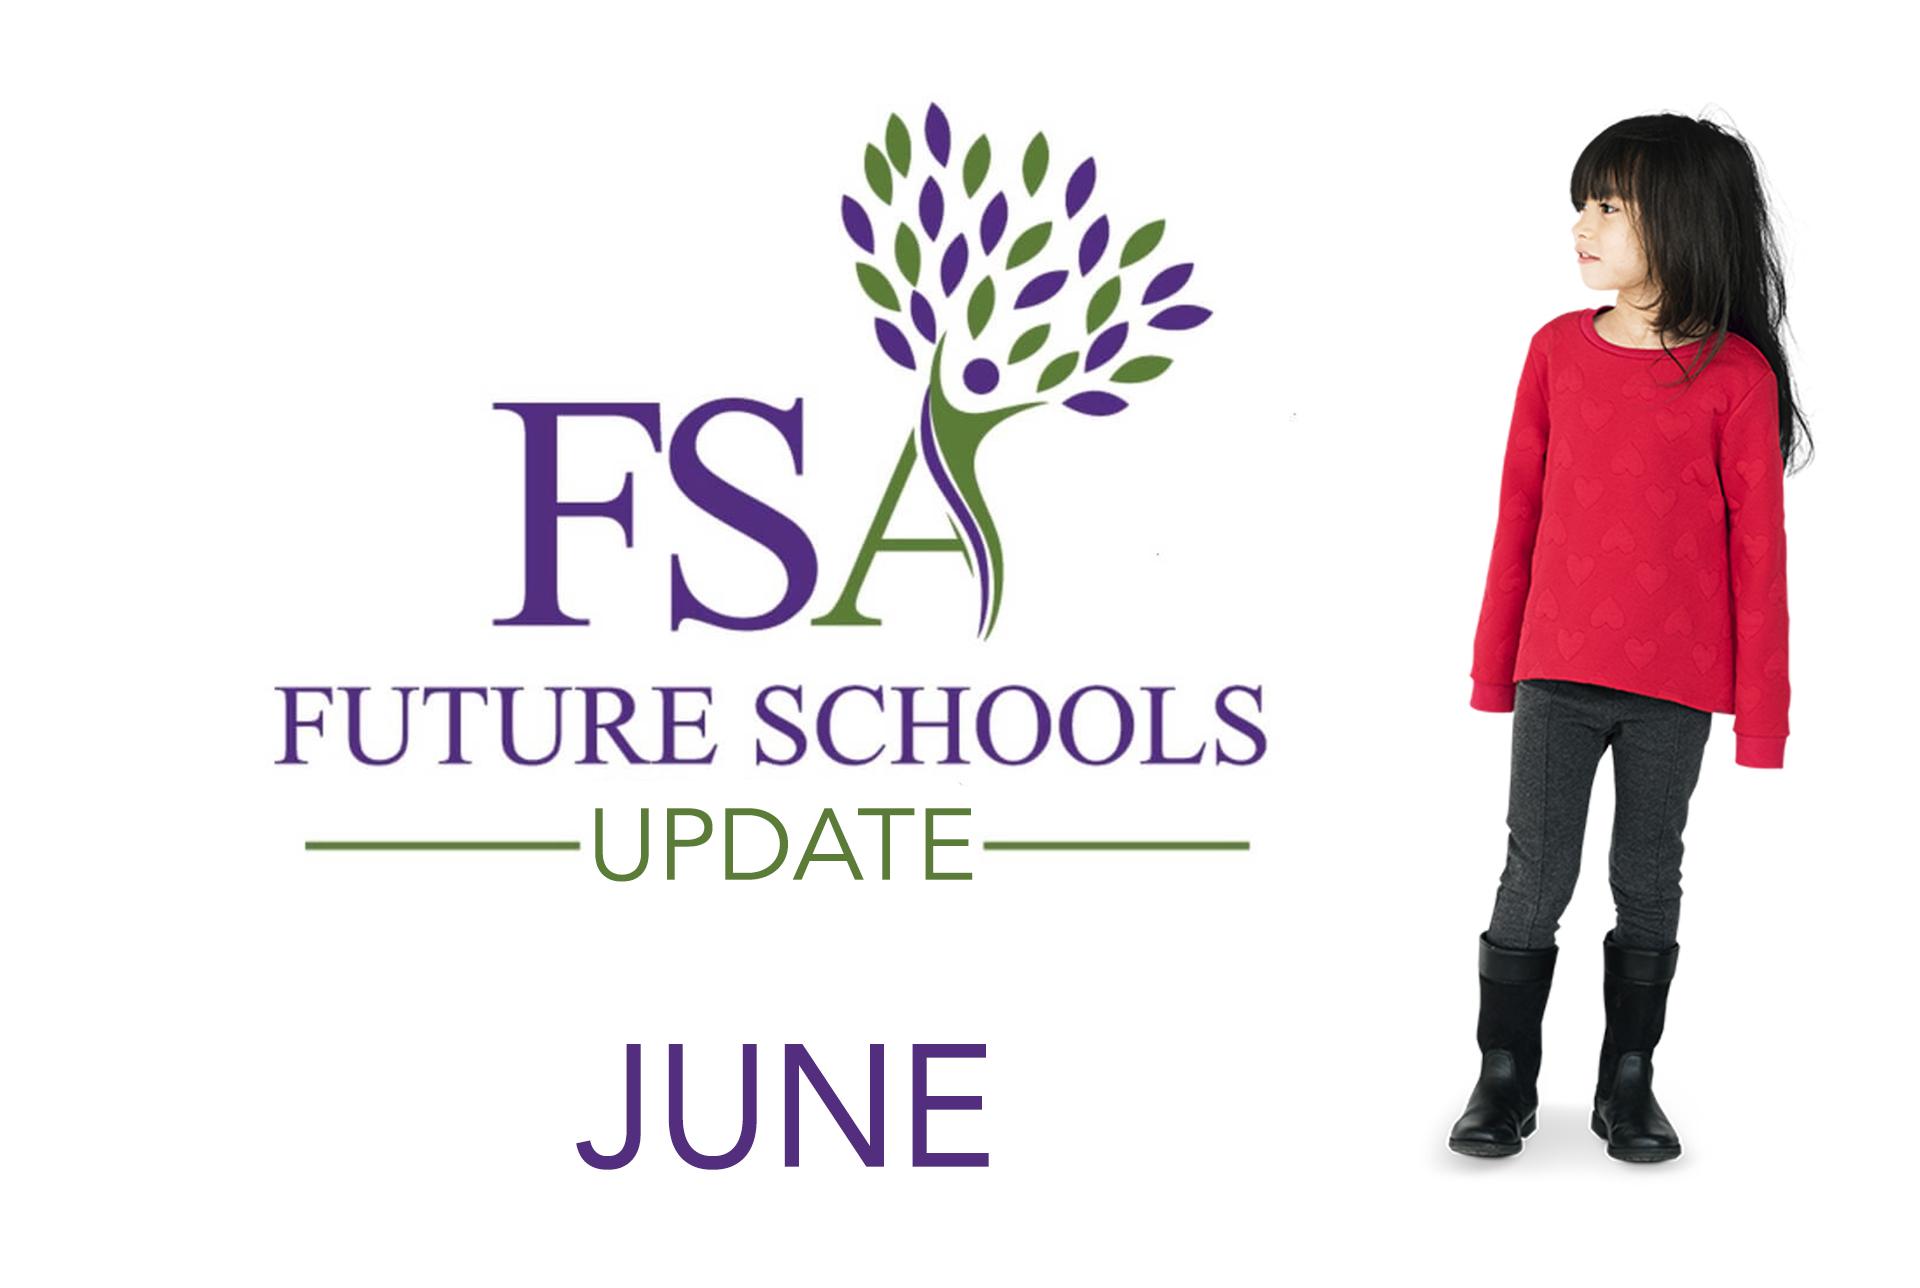 Update June